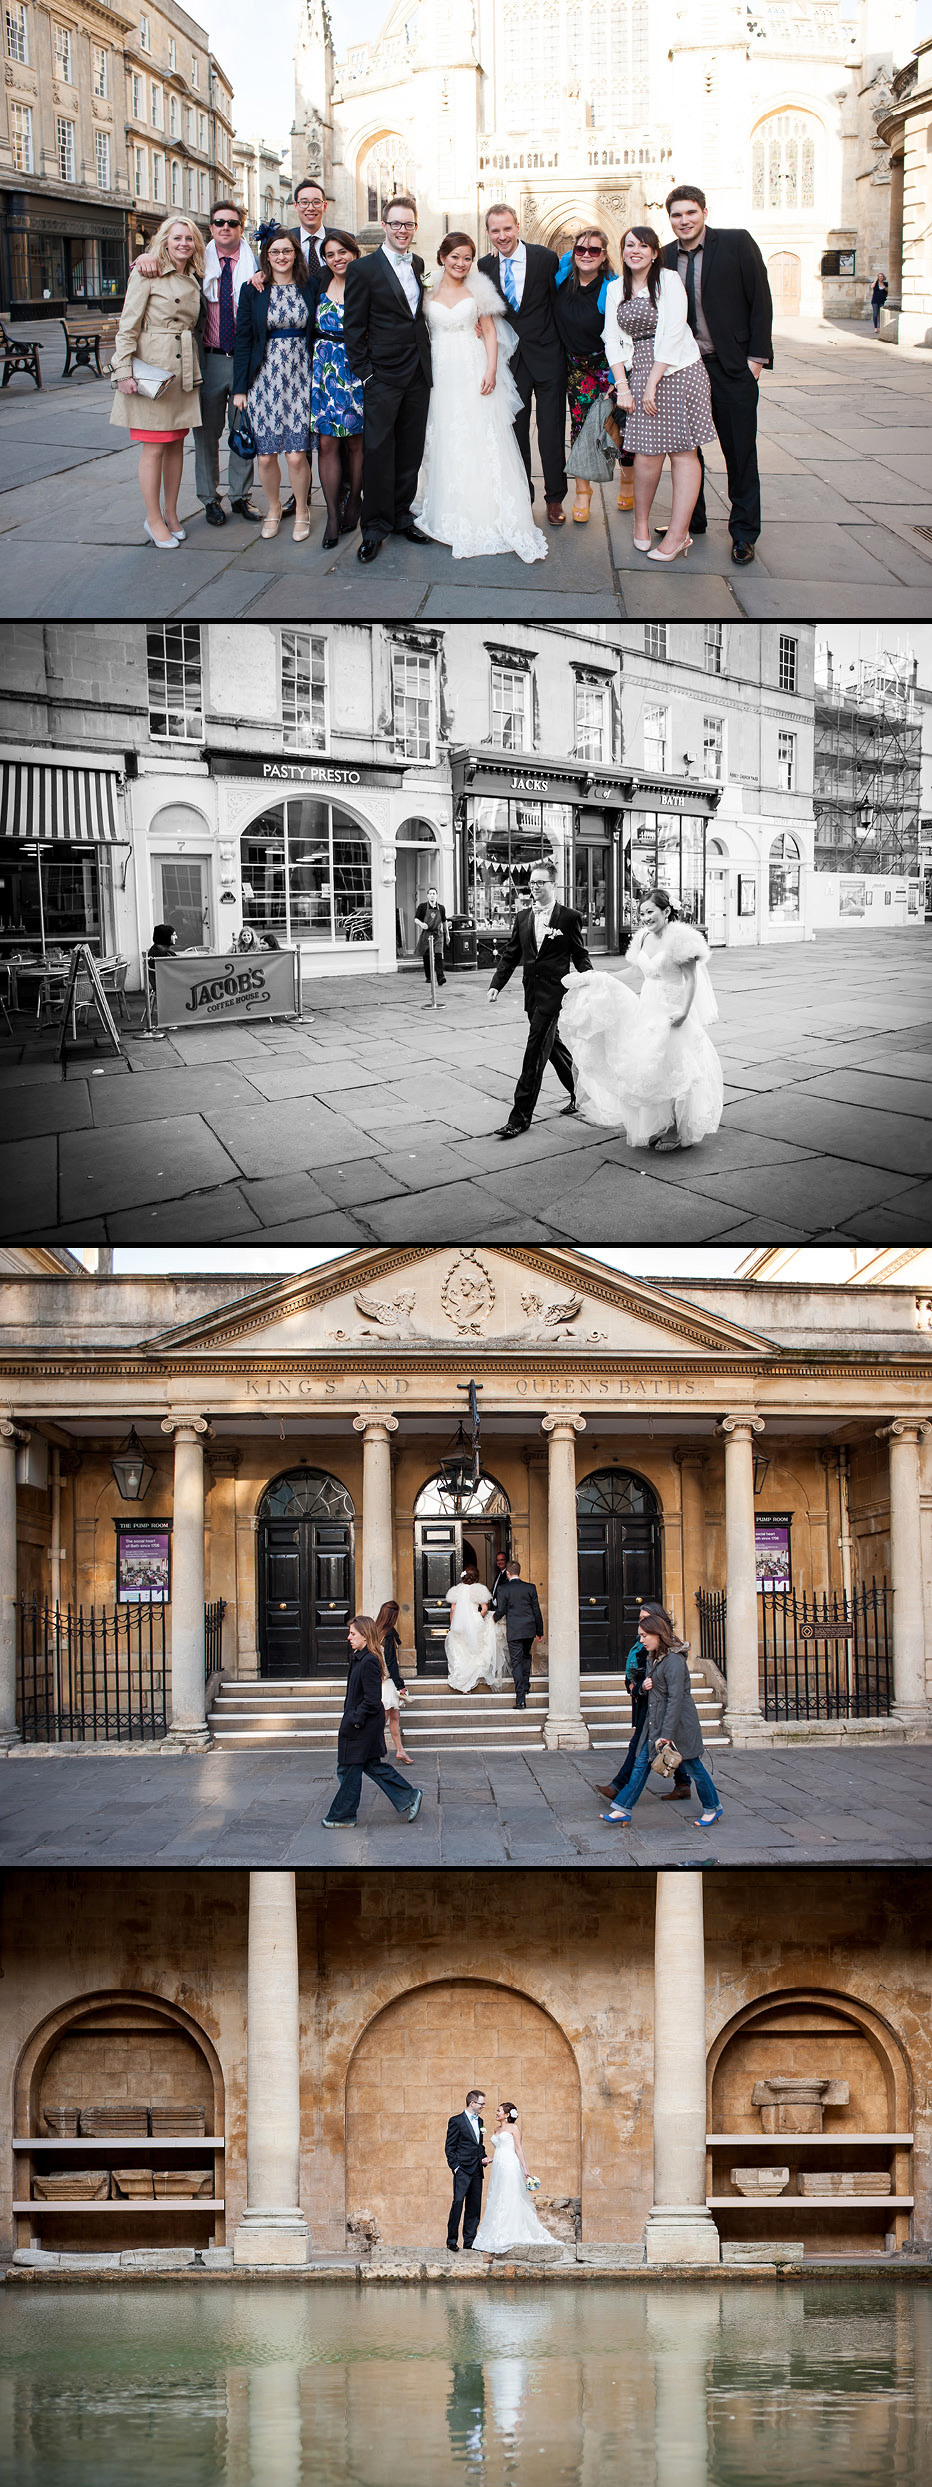 roman baths wedding photographer